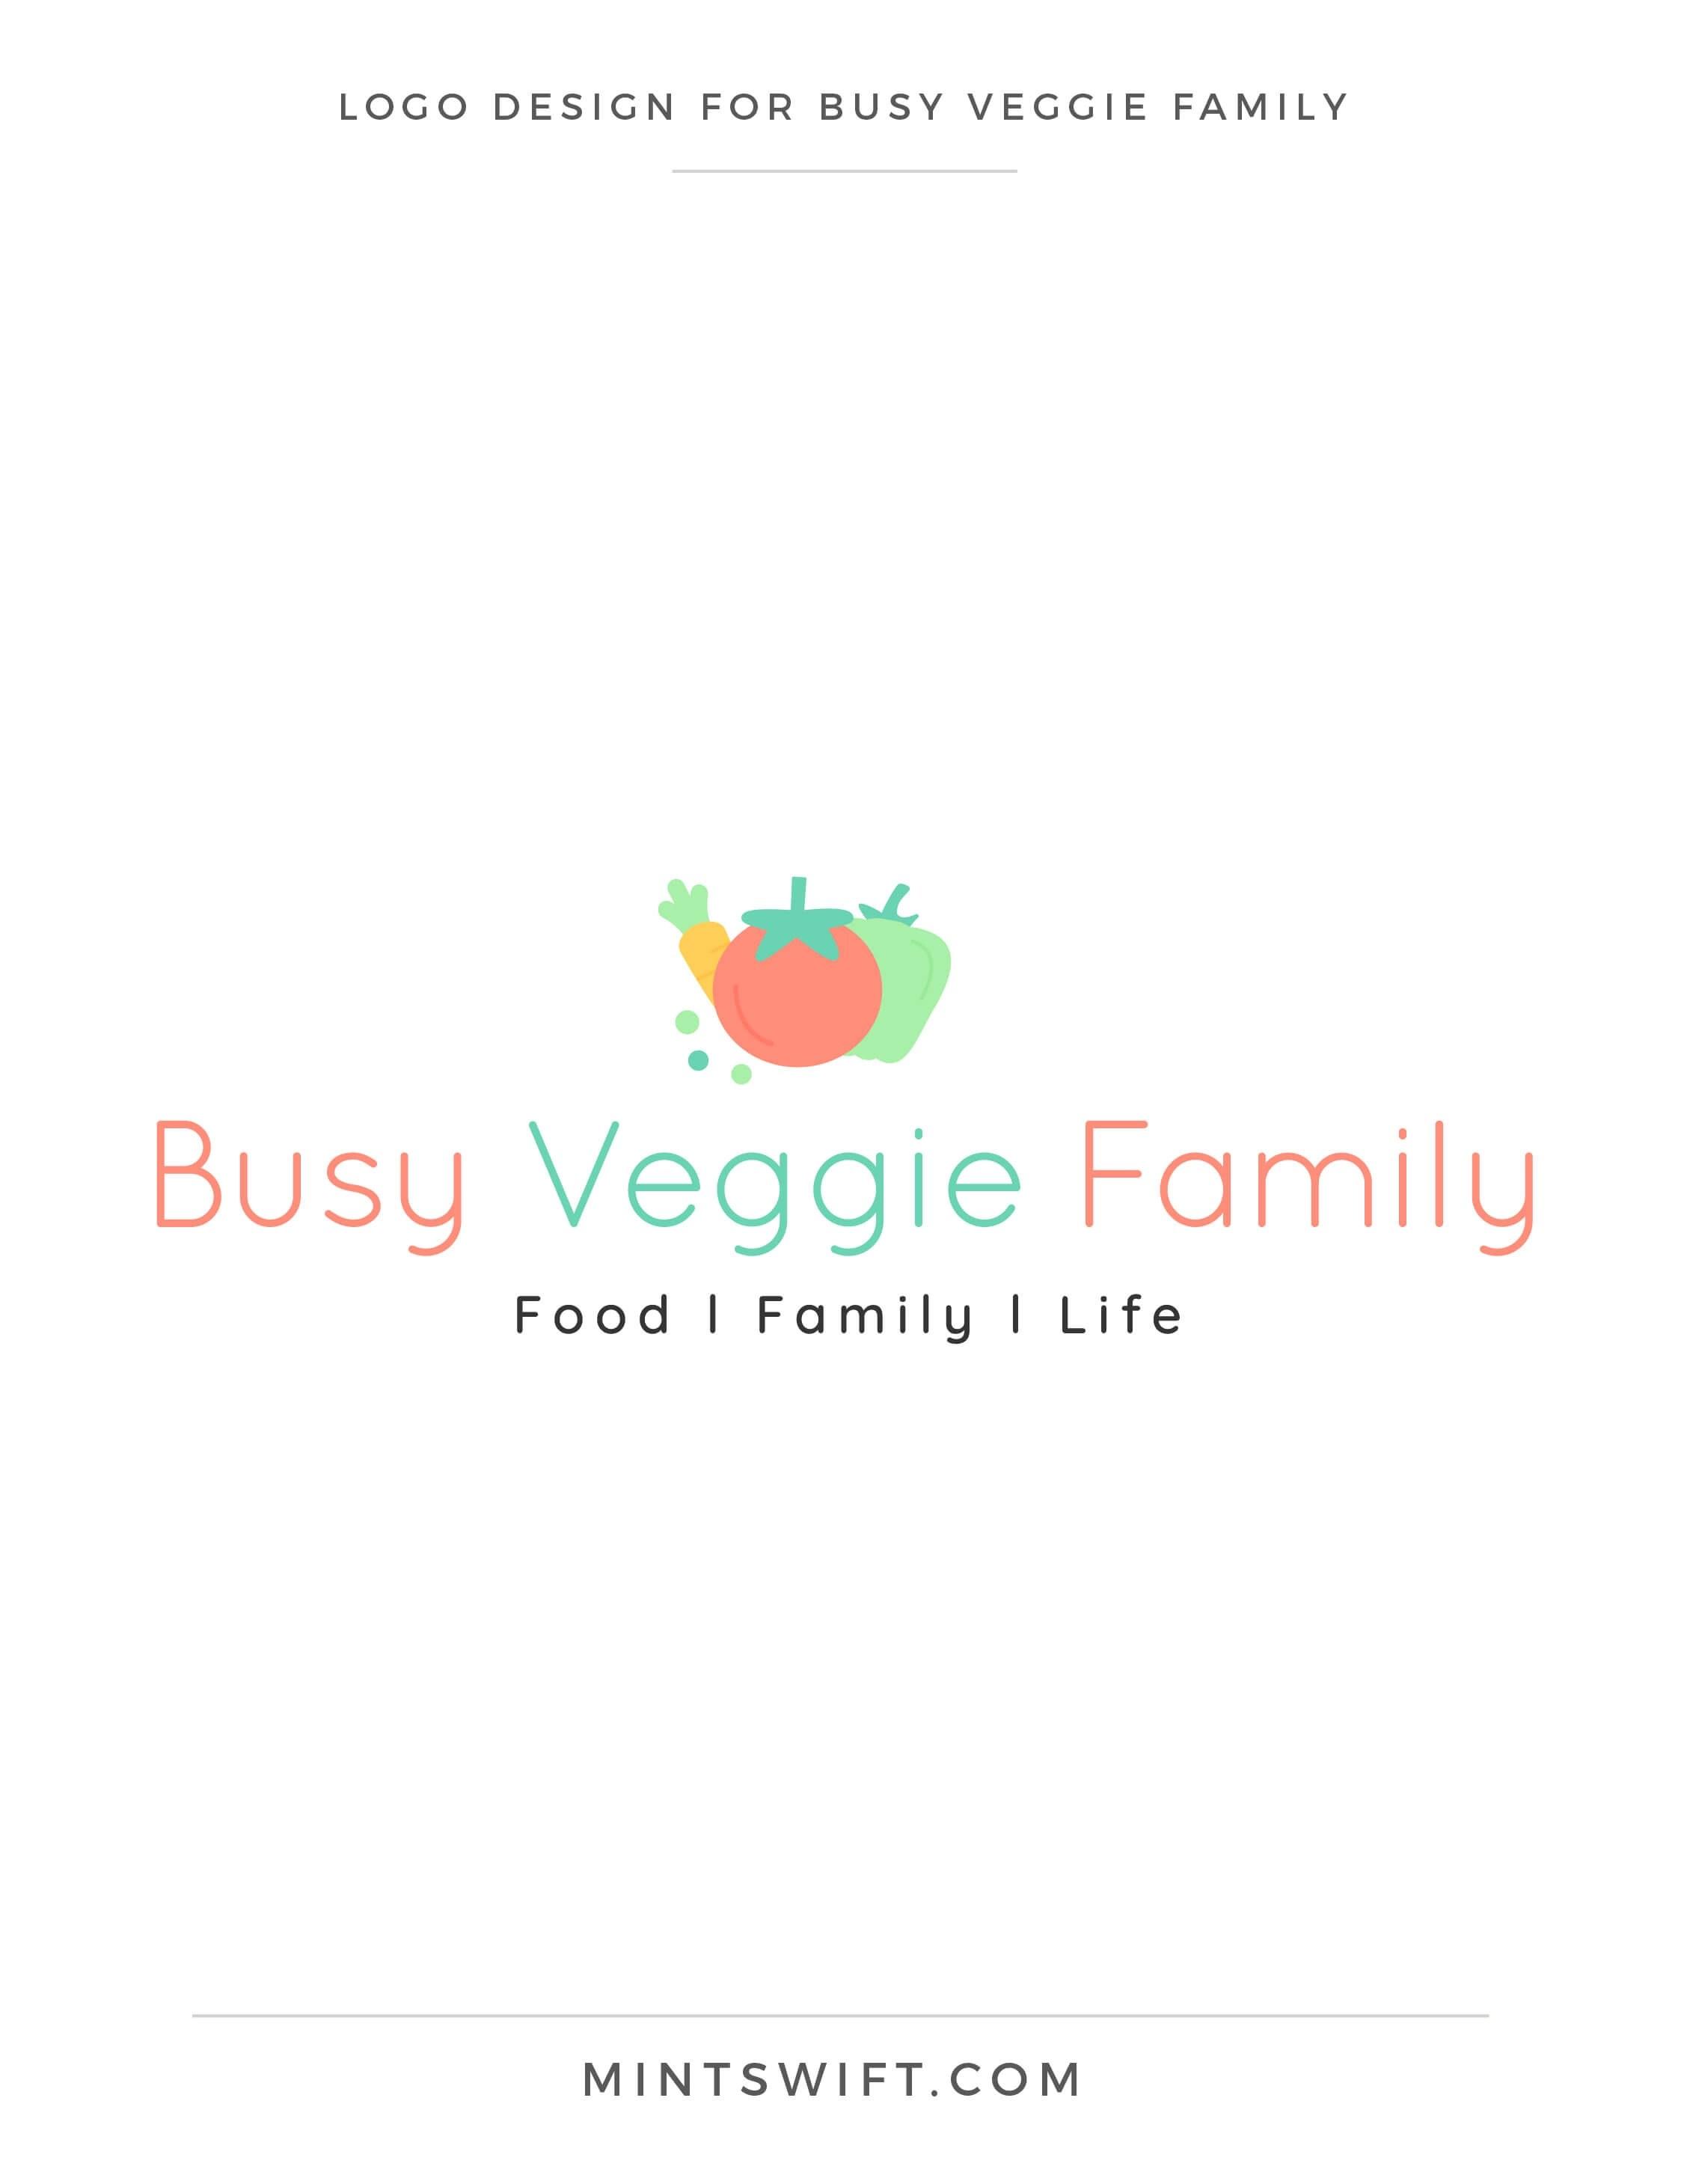 Busy Veggie Family - Logo Design - Brand & Website Design Package - MintSwift